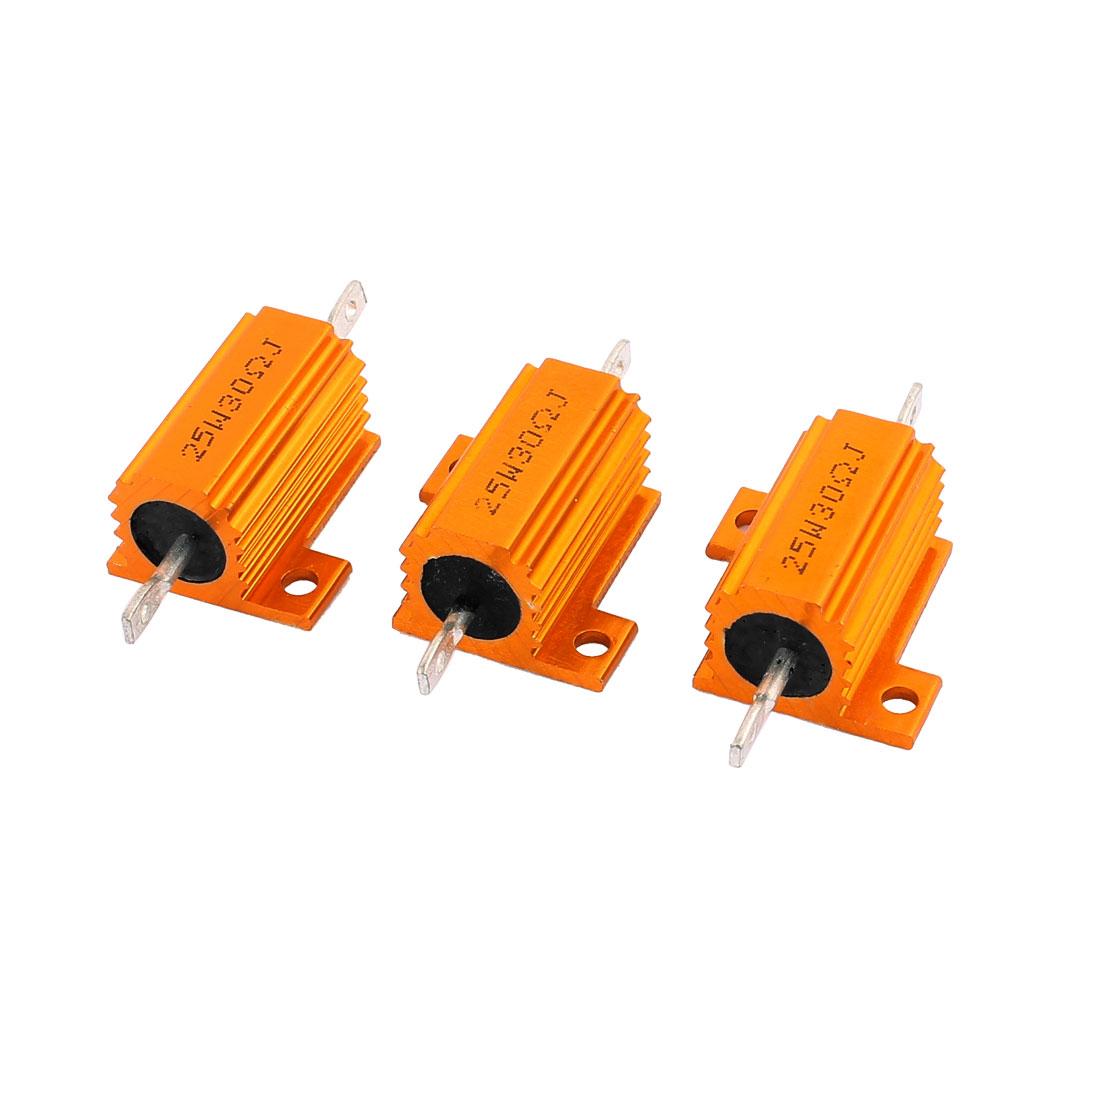 30 Ohm +/- 5% 25W Rose Gold Tone Aluminum Housed Wirewound Resistors 3 Pcs